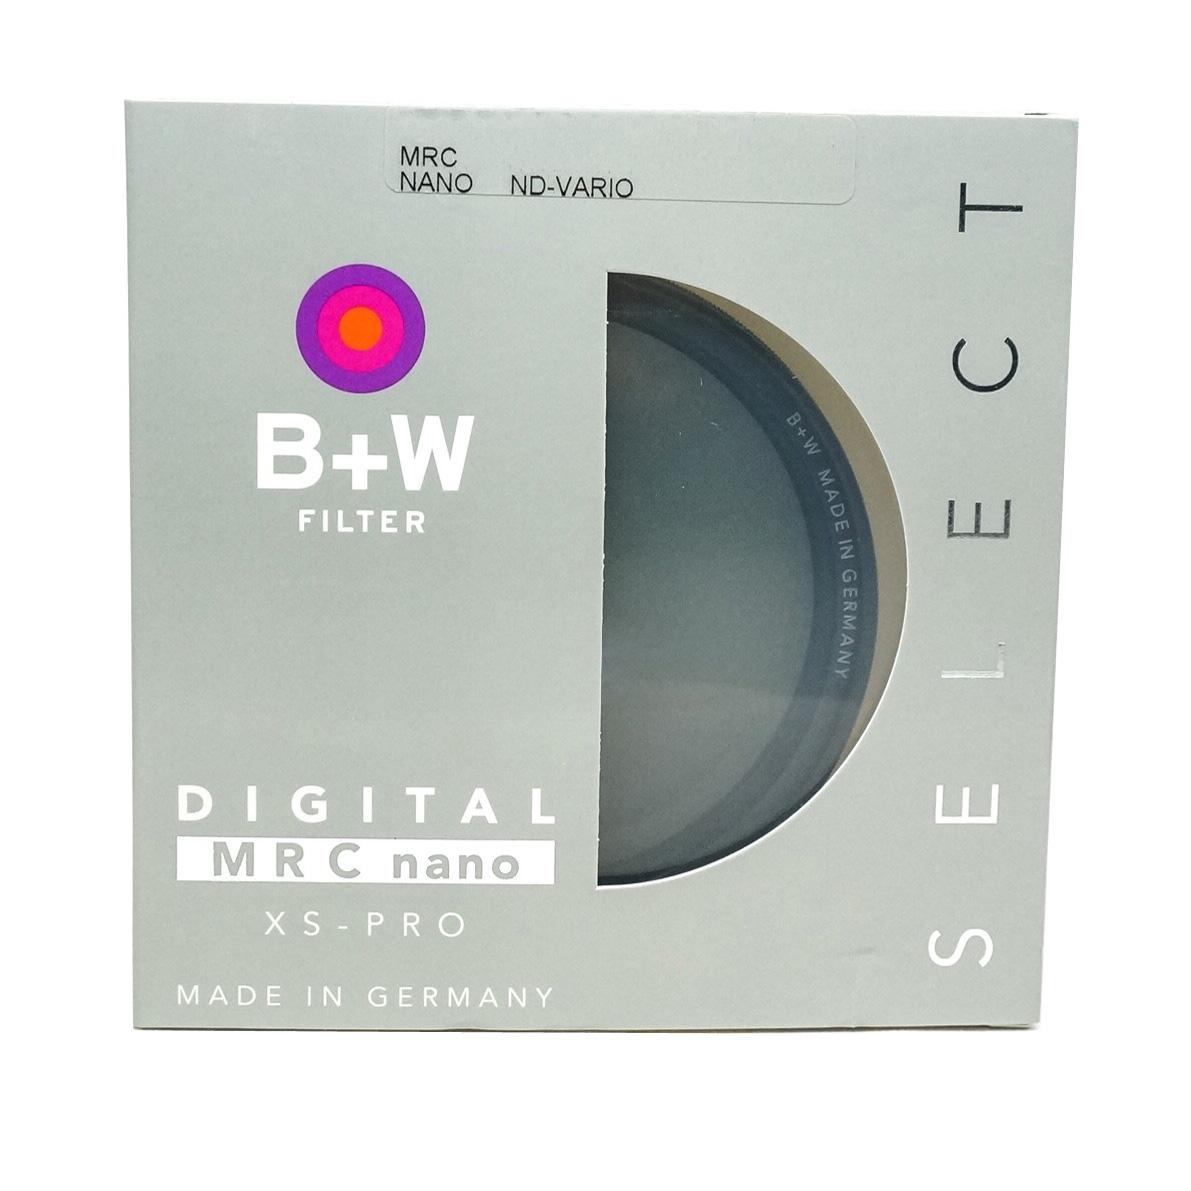 B+W 82 mm XS-Pro ND Vario MRC nano Digital Neutral Density Filter